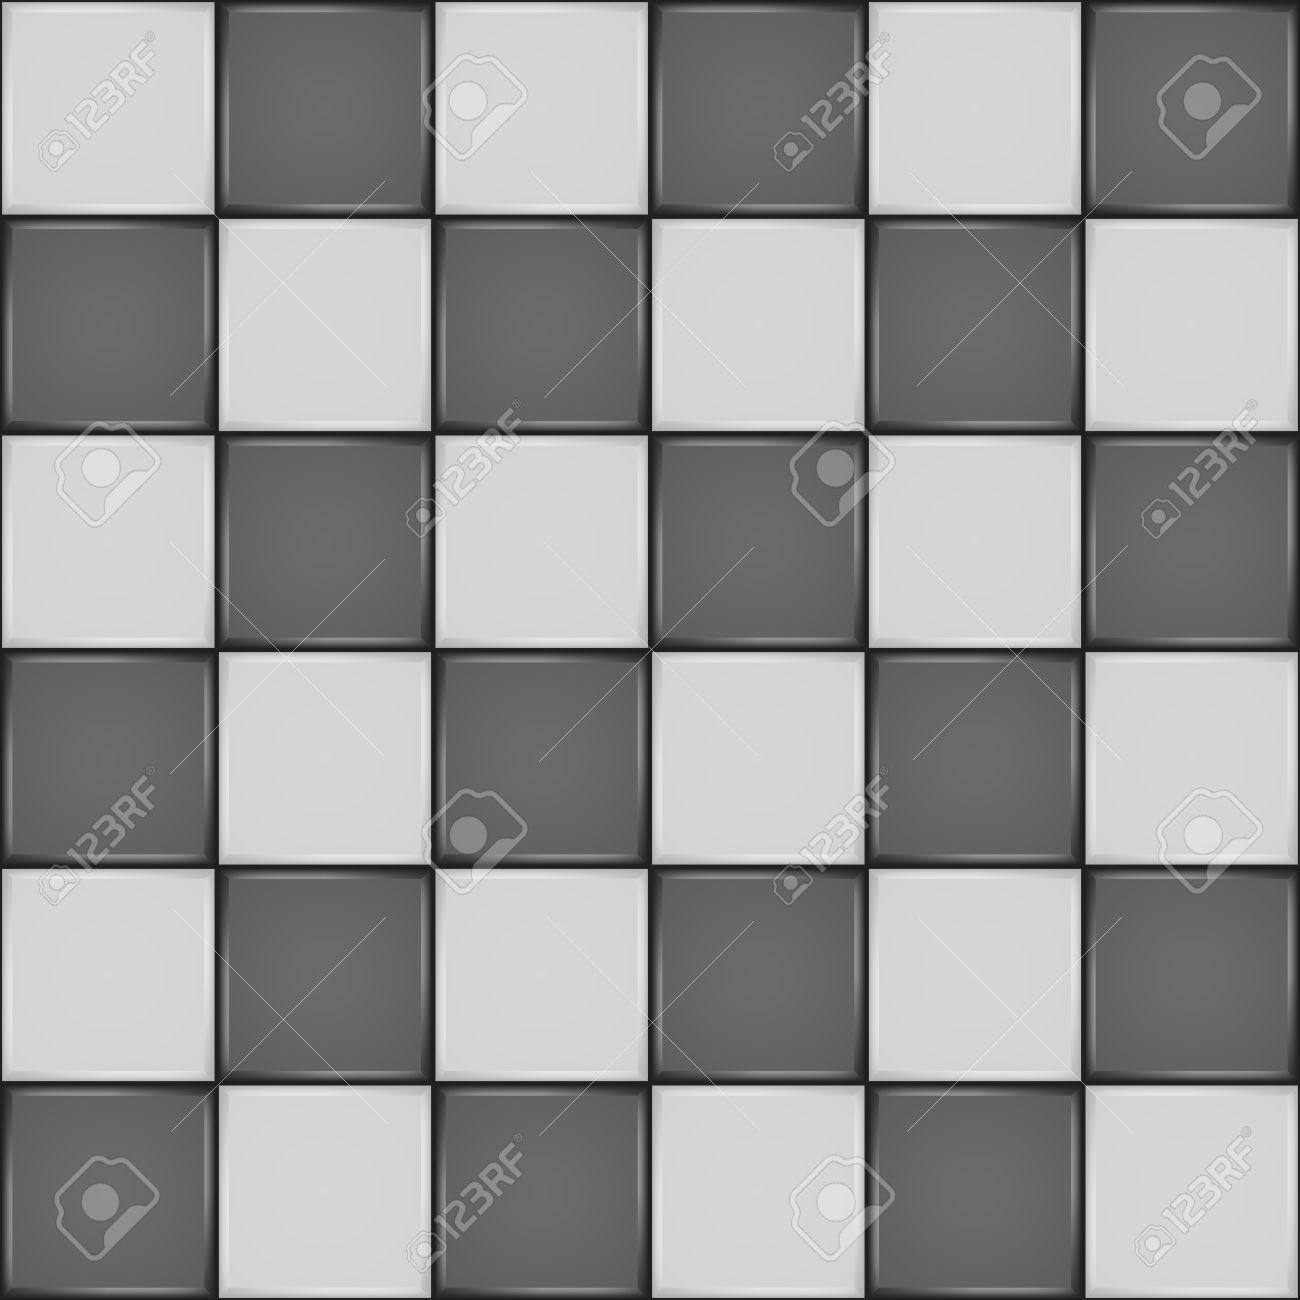 Black And White Ceramic Tile Bathroom Wall Or Floor Seamless ...